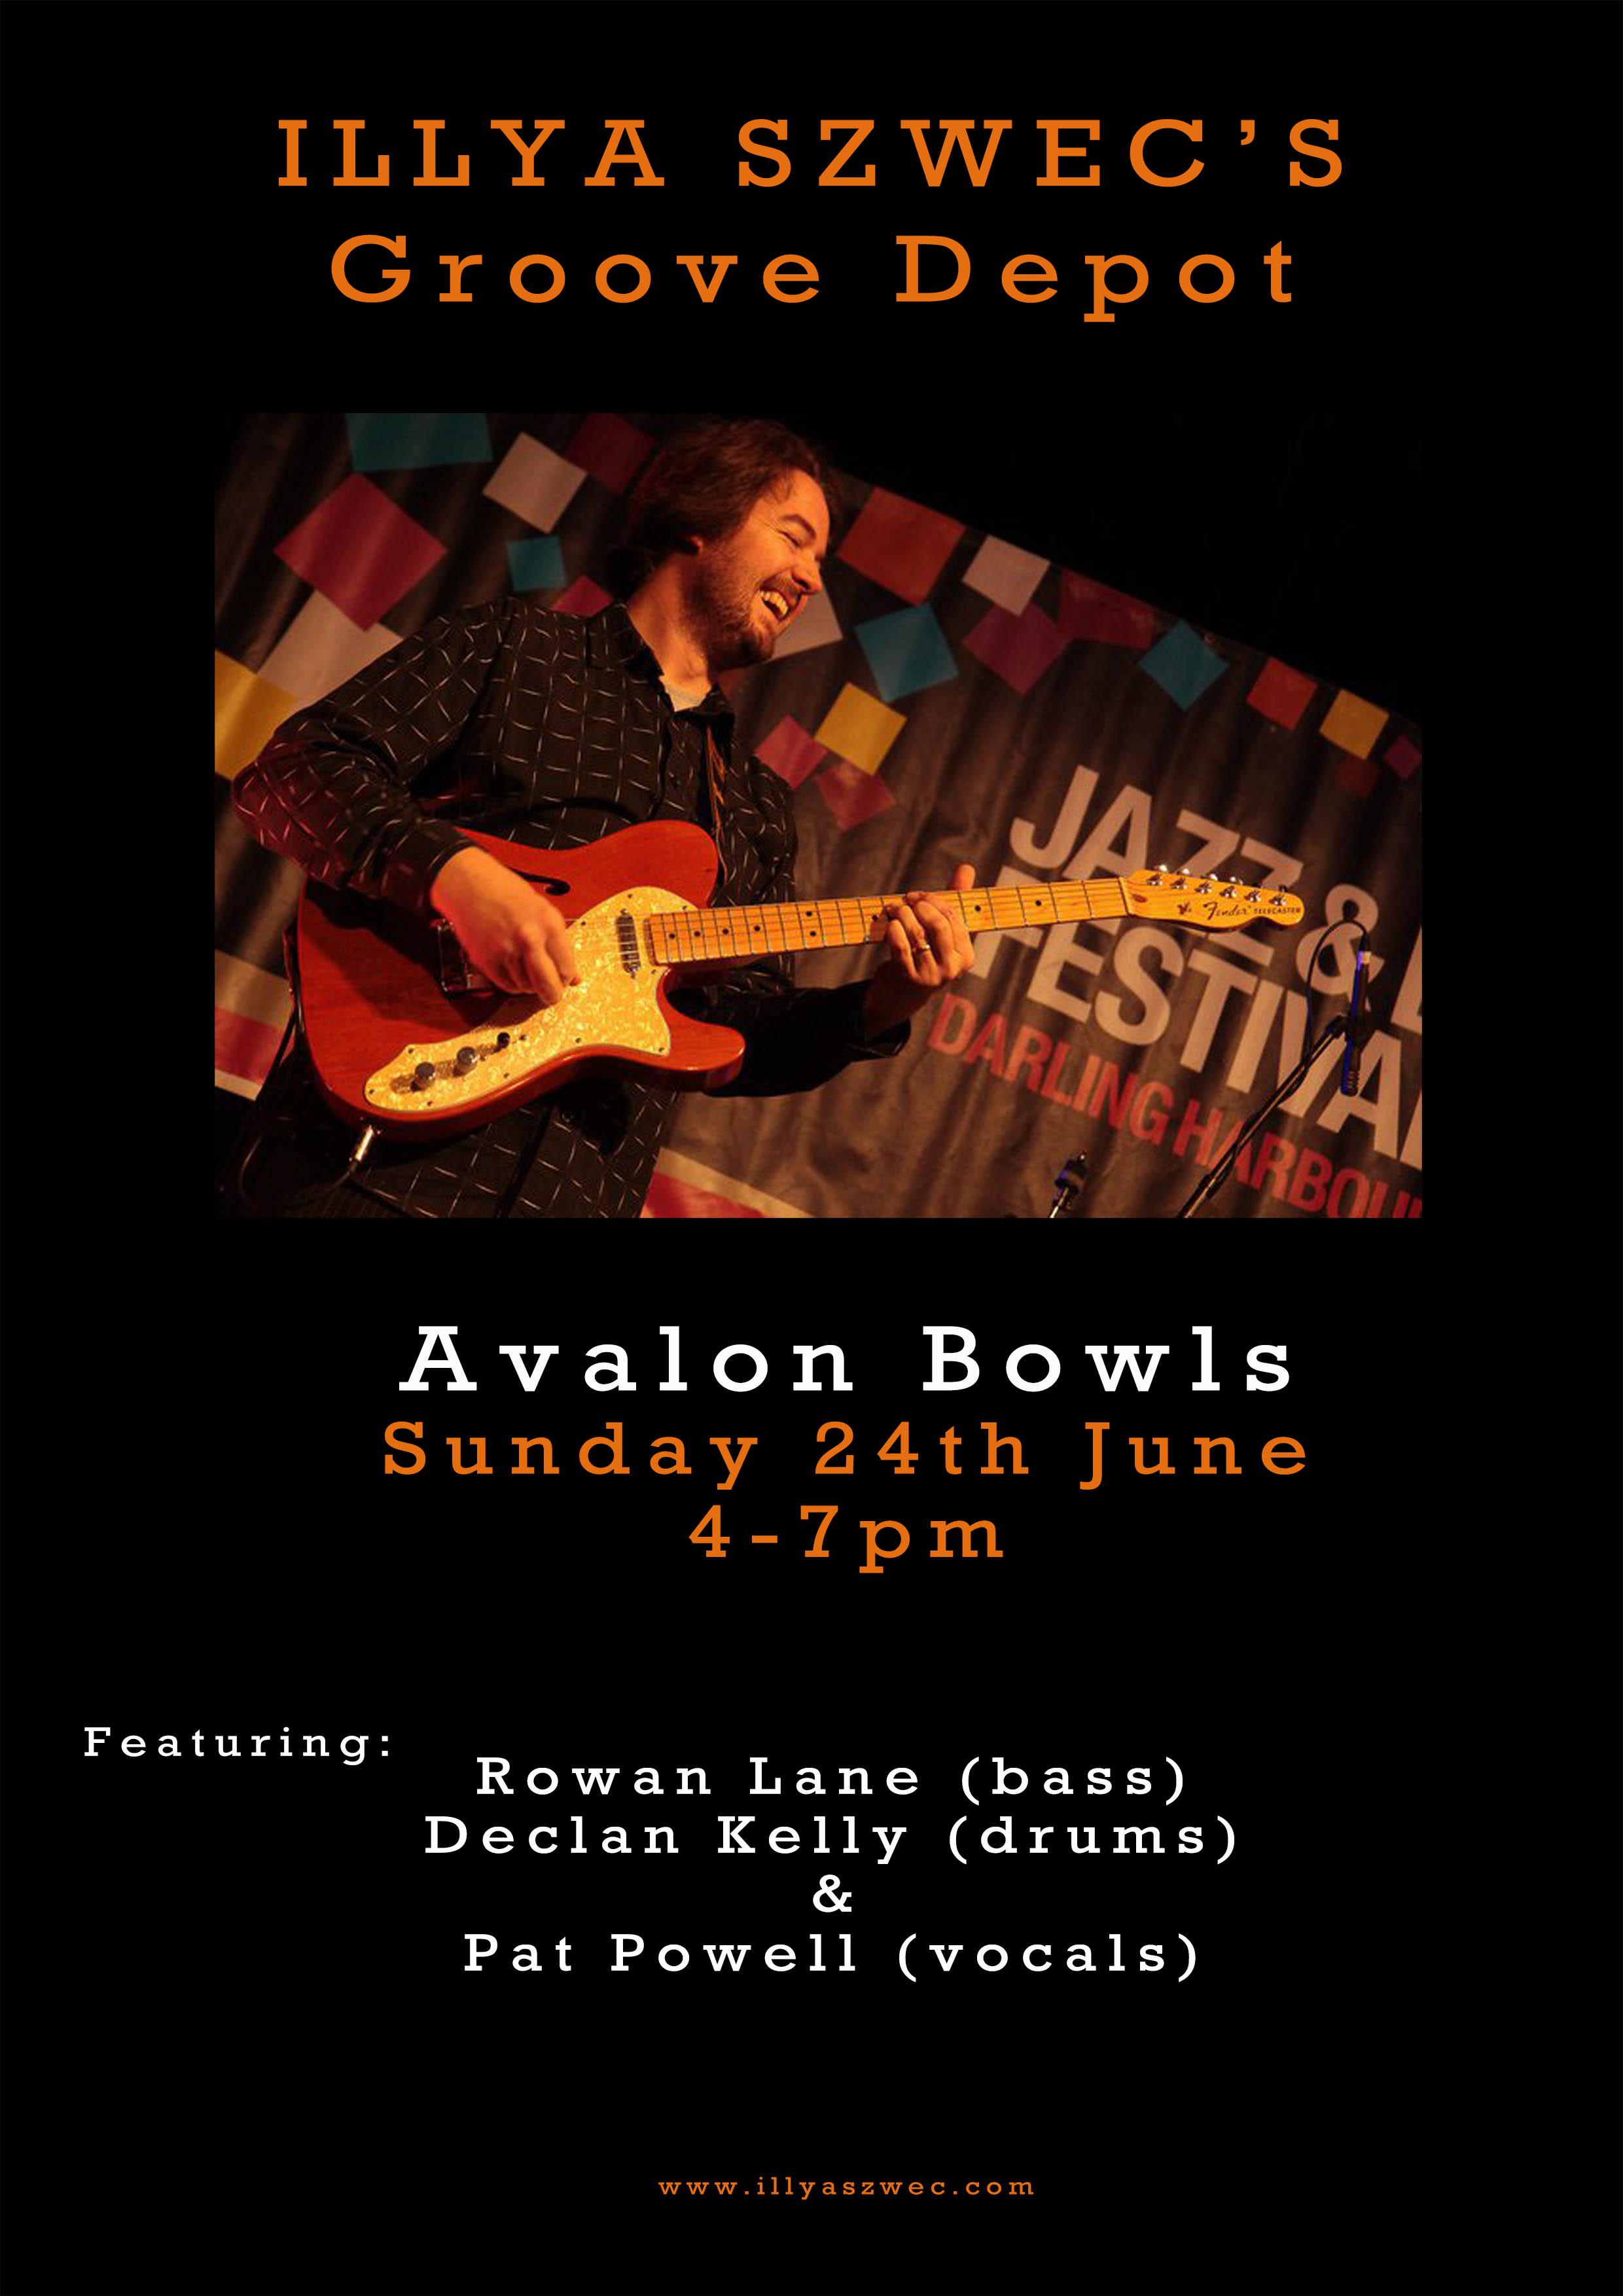 Avalon Bowls 24th June.jpg